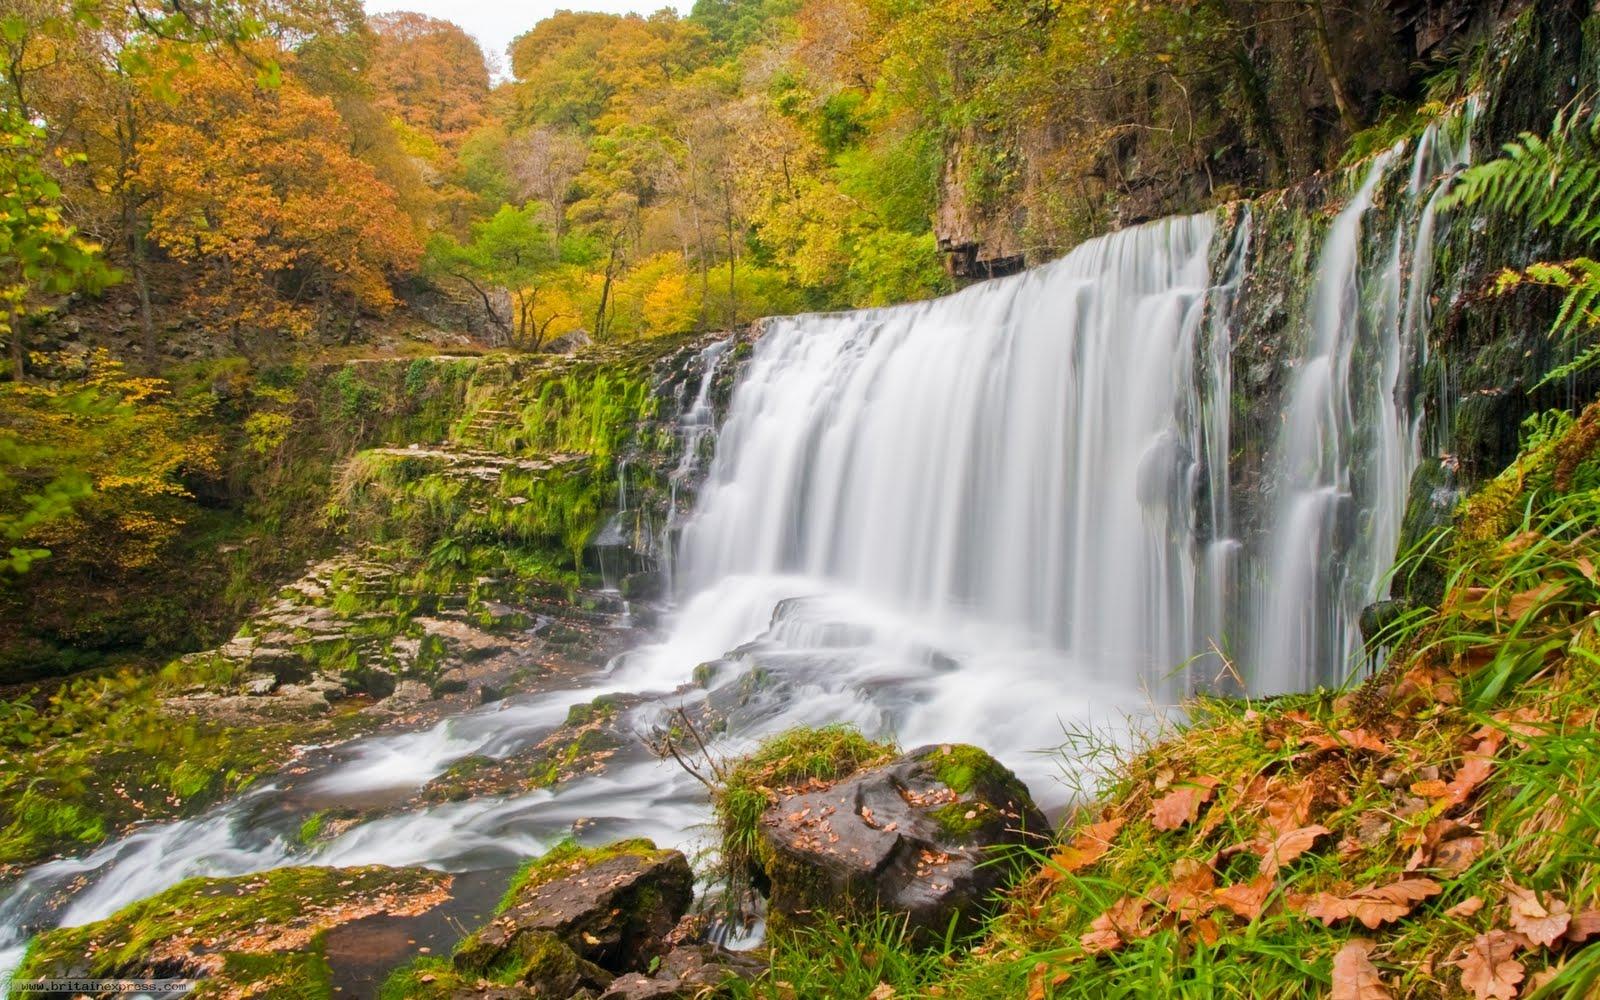 Cascada de agua clara - Waterfalls (1920x1200px)